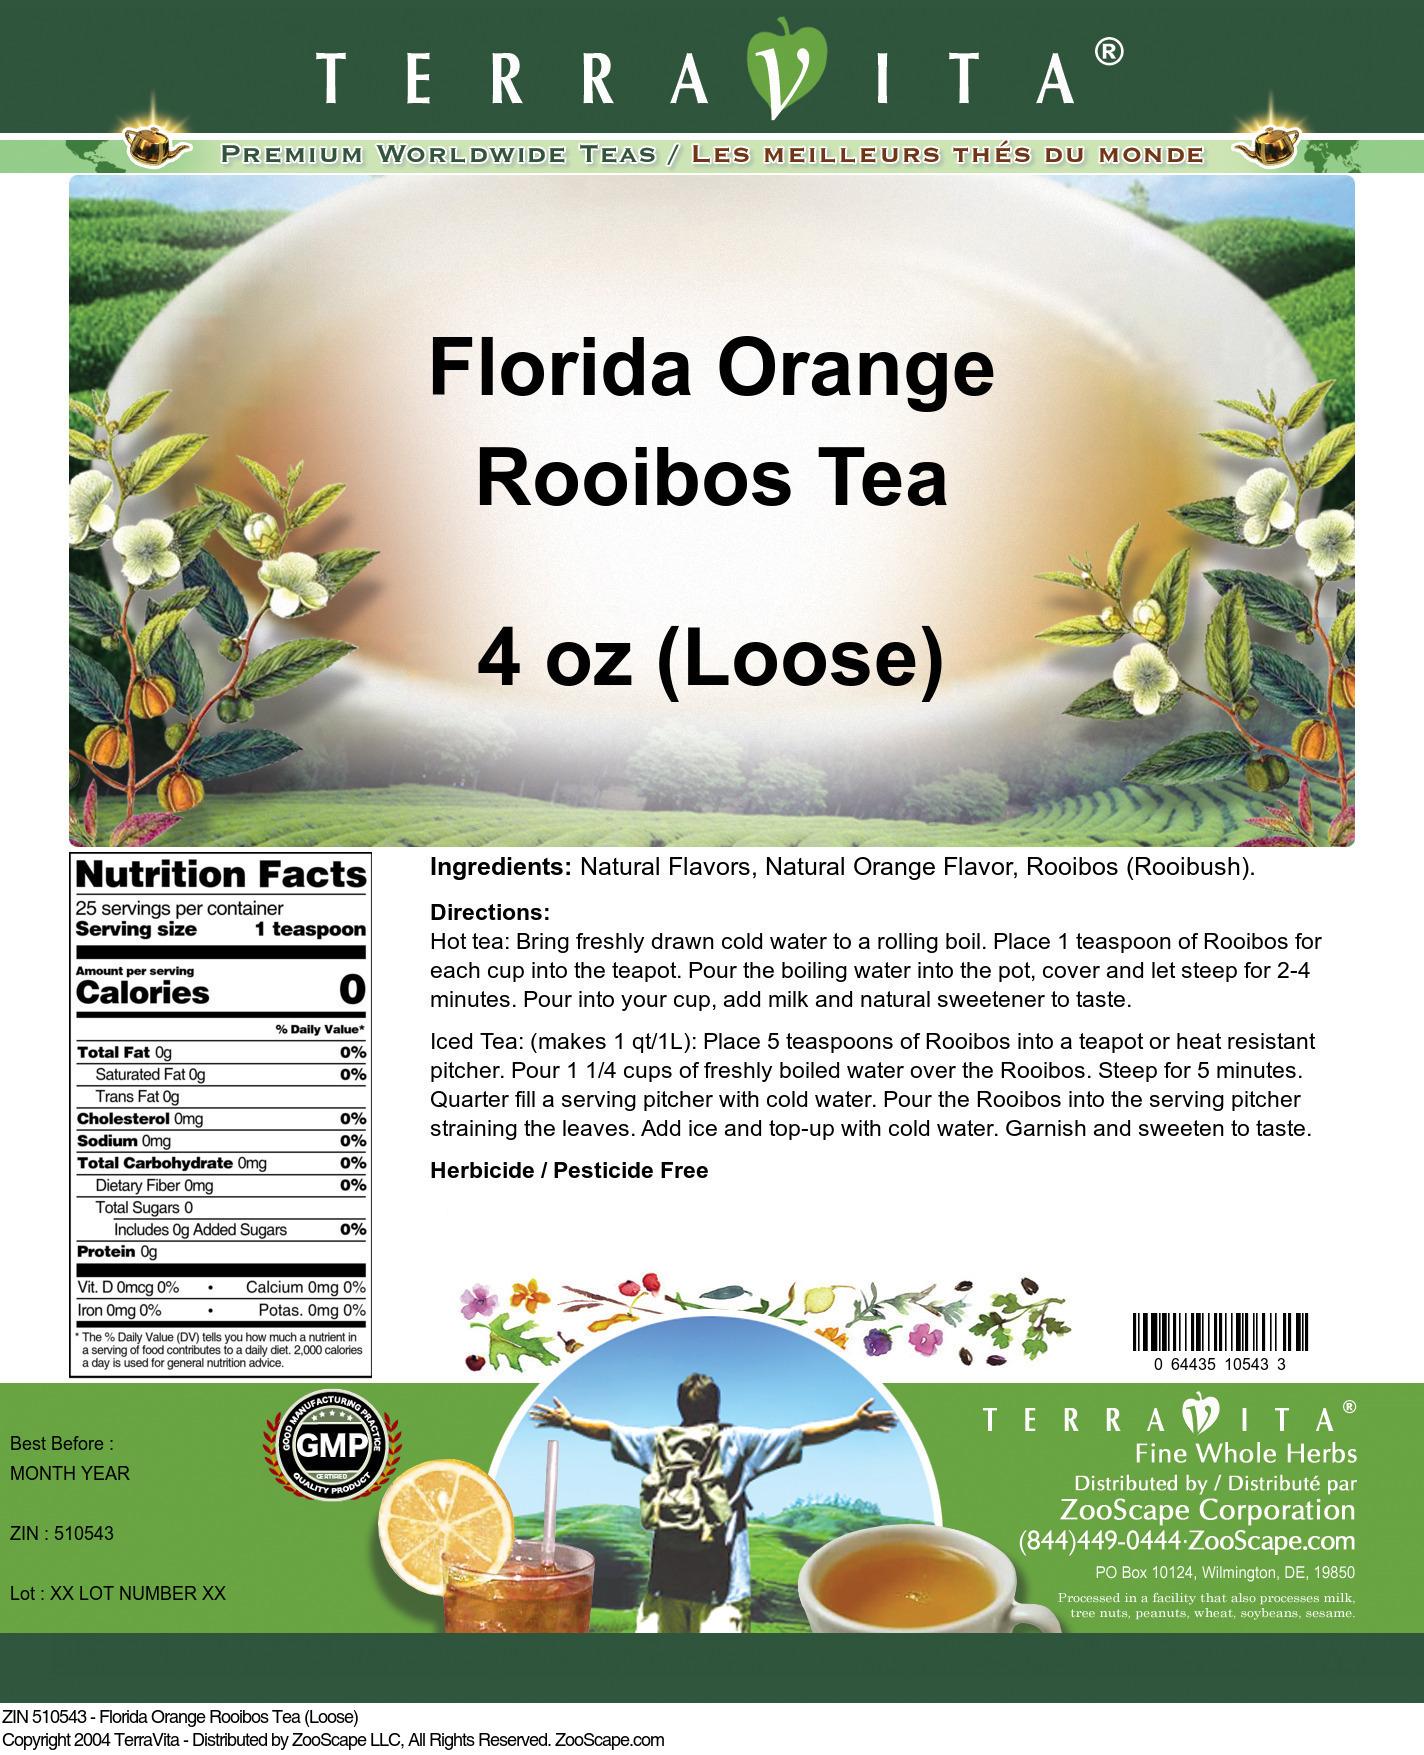 Florida Orange Rooibos Tea (Loose)